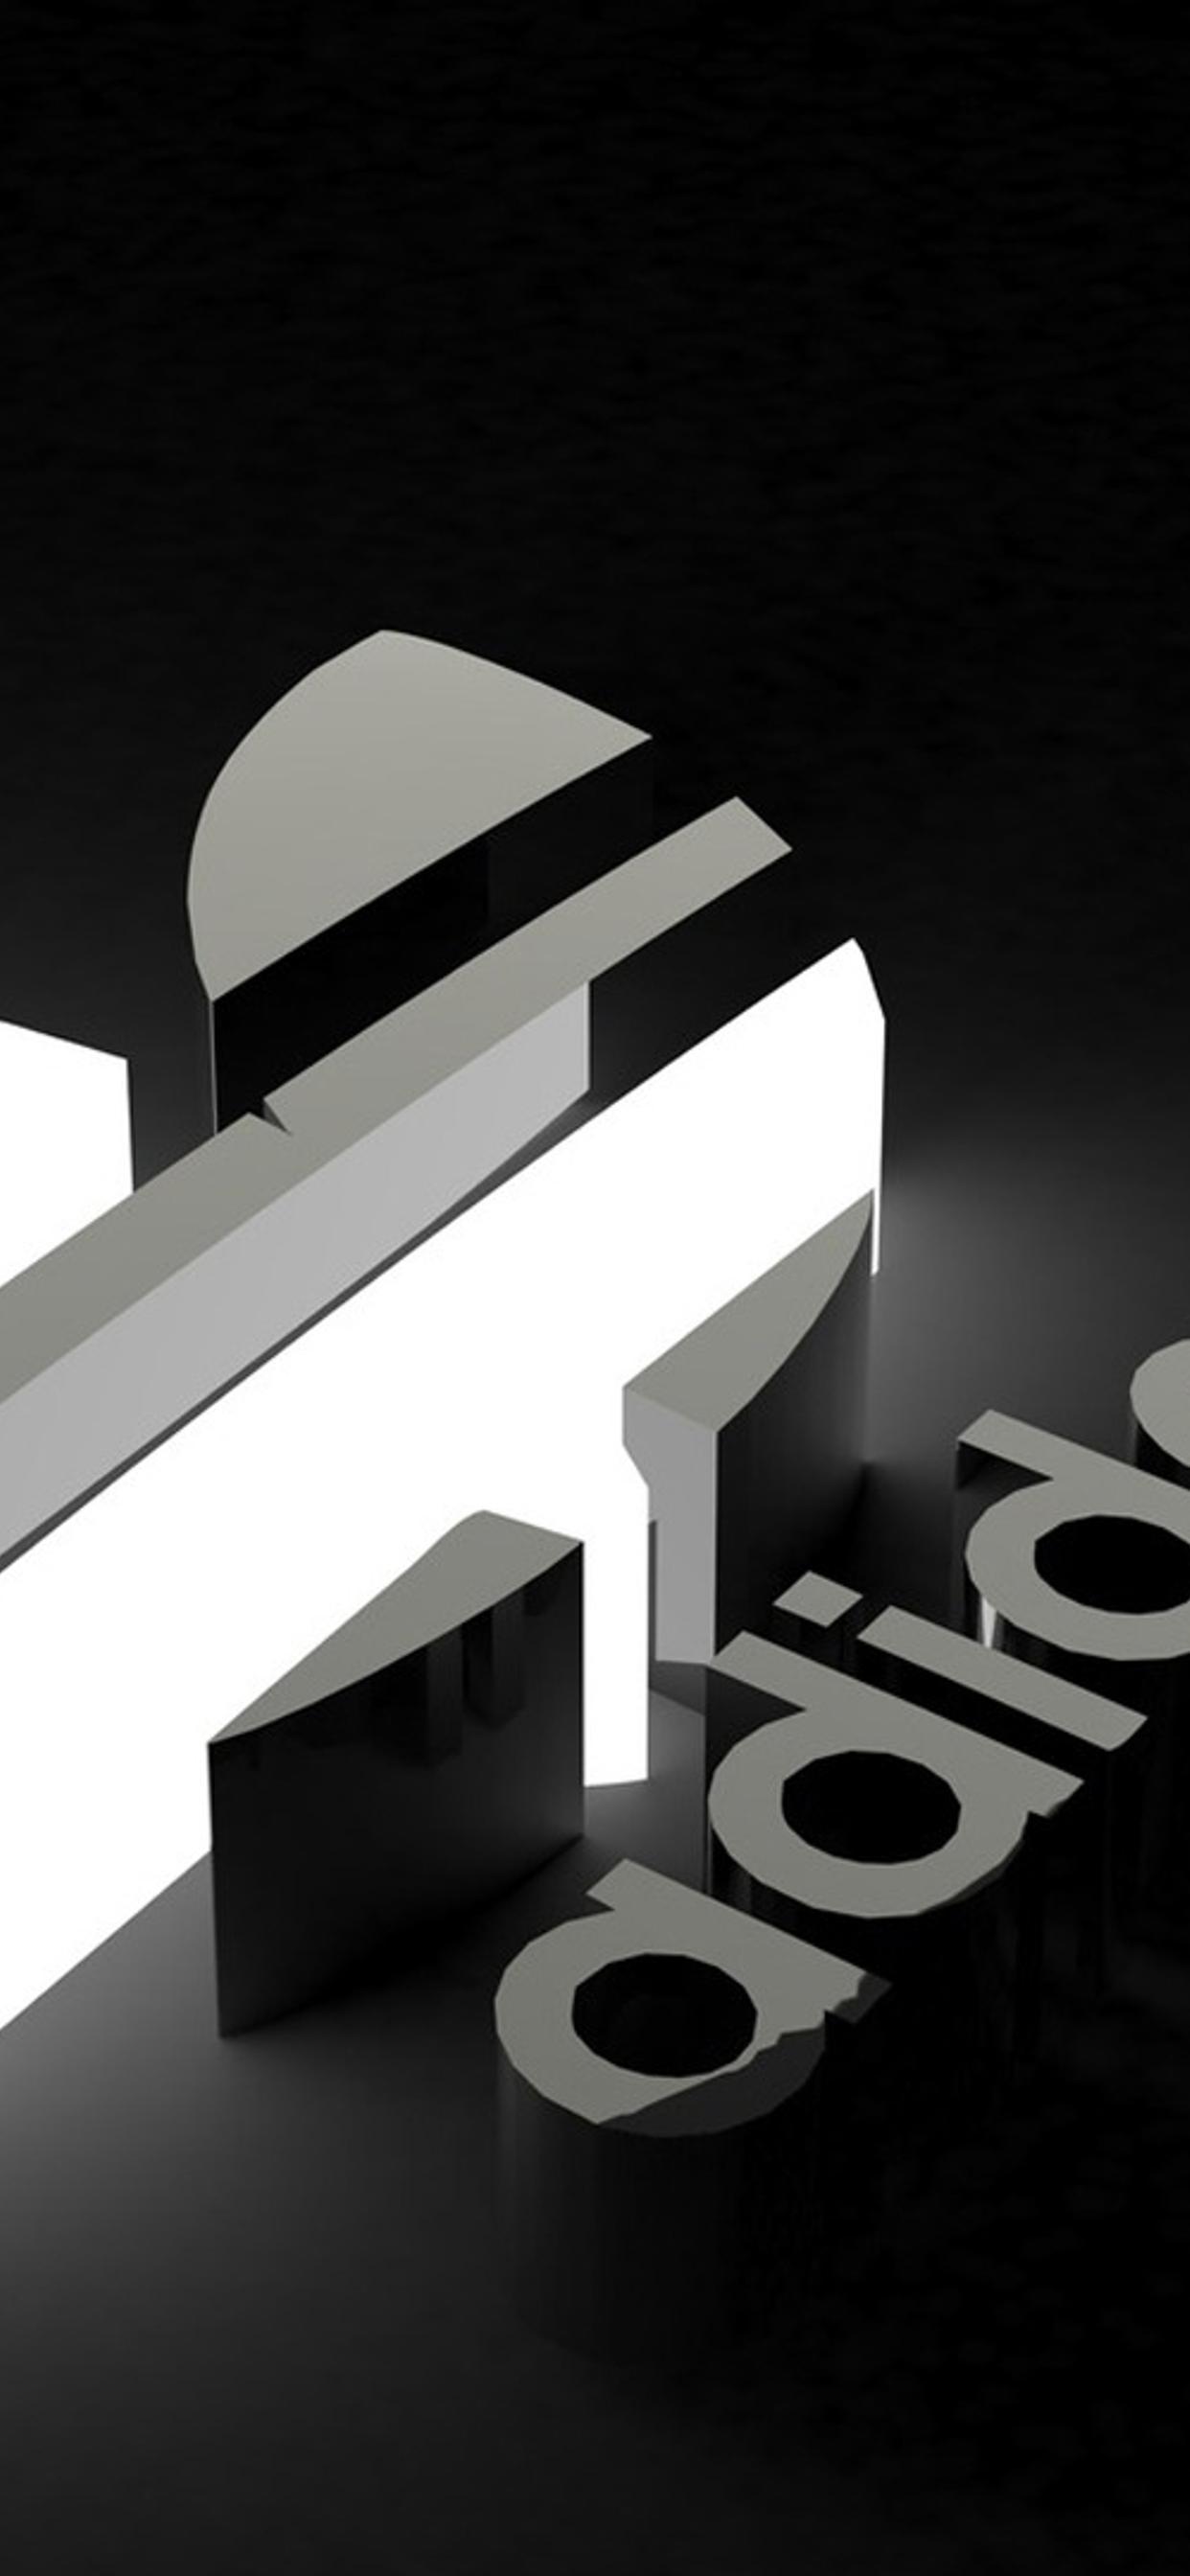 Adidas Logo Black And White 3d Wallpaper